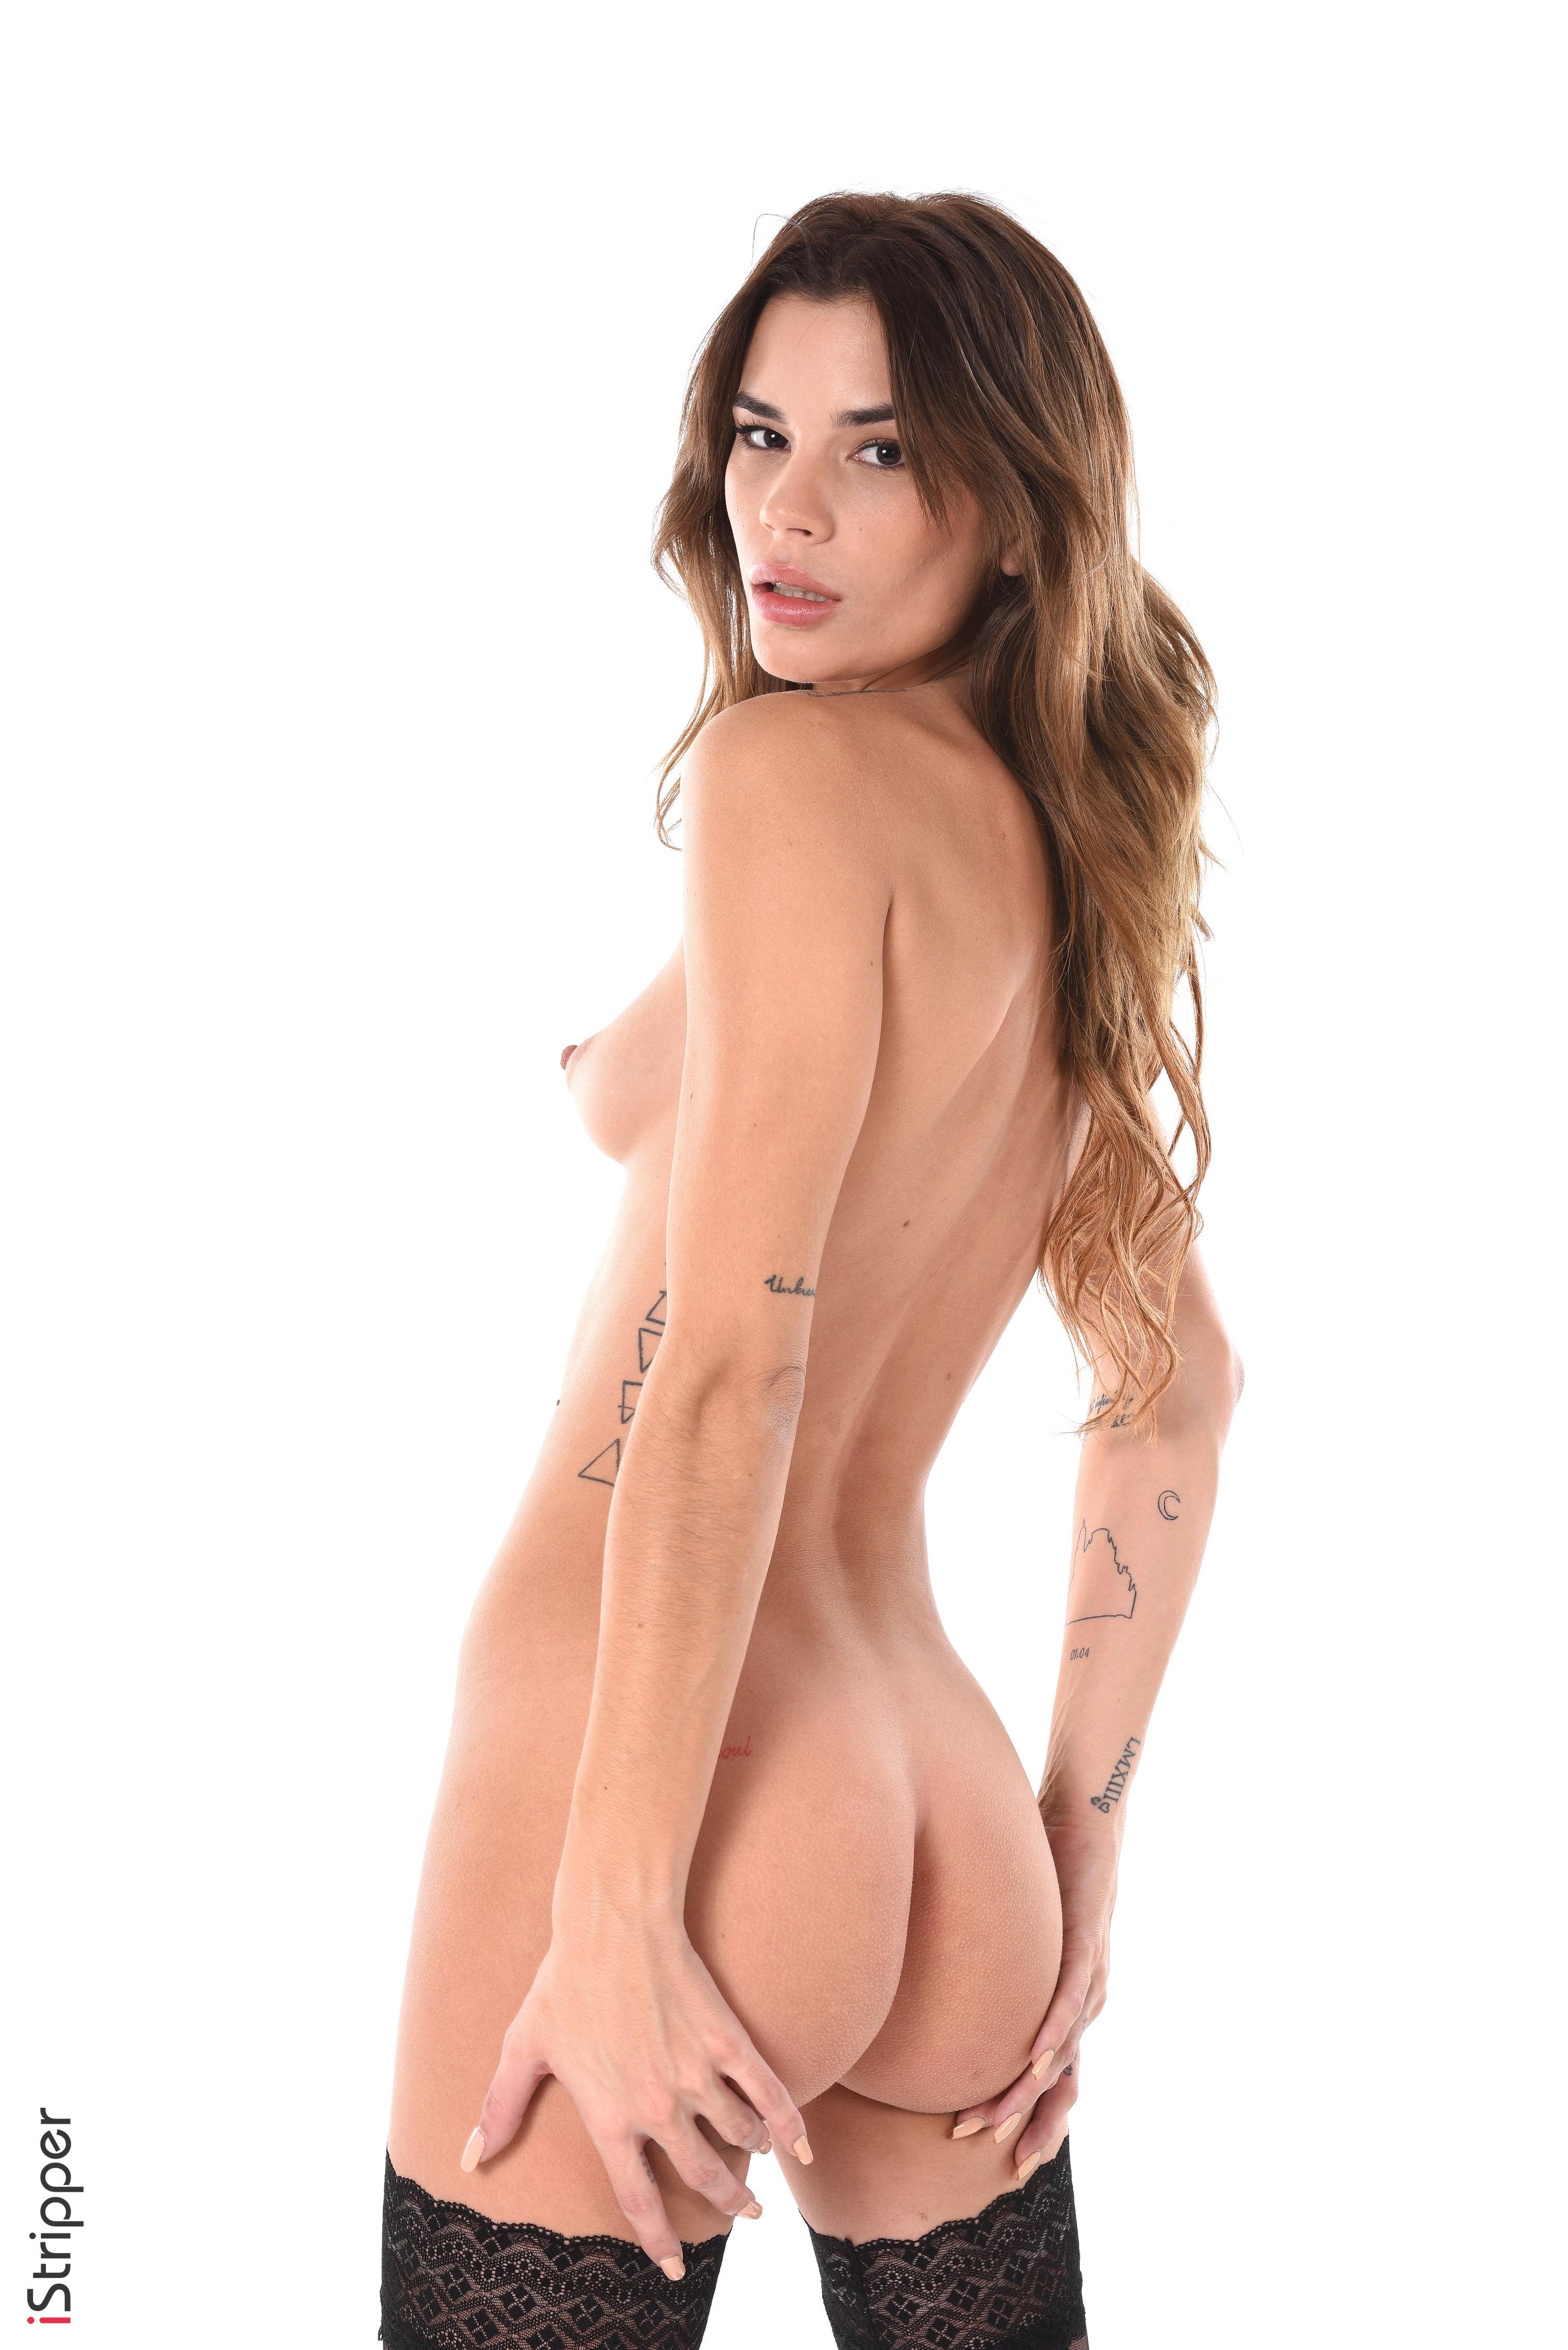 beautiful naked women wallpaper